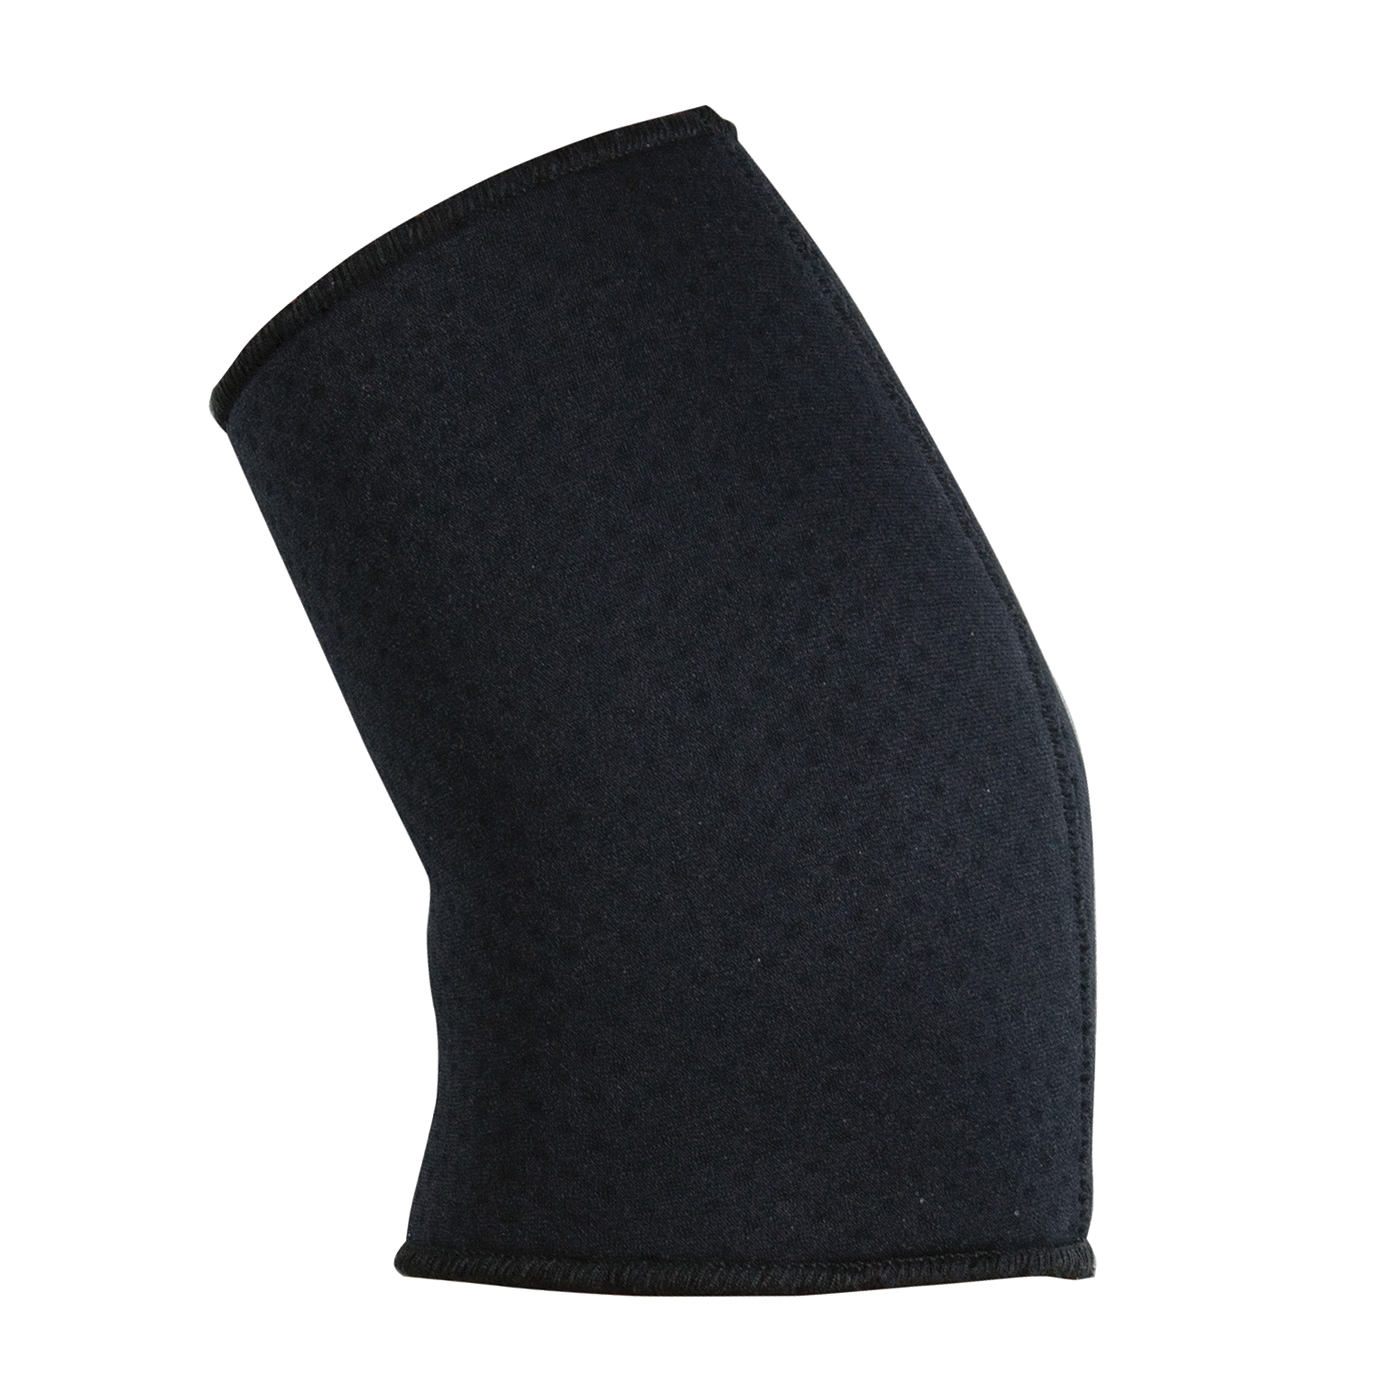 PIP® 290-9001L Ambidextrous Elbow Sleeve, L, Terry Lined Neoprene/Nylon, Black